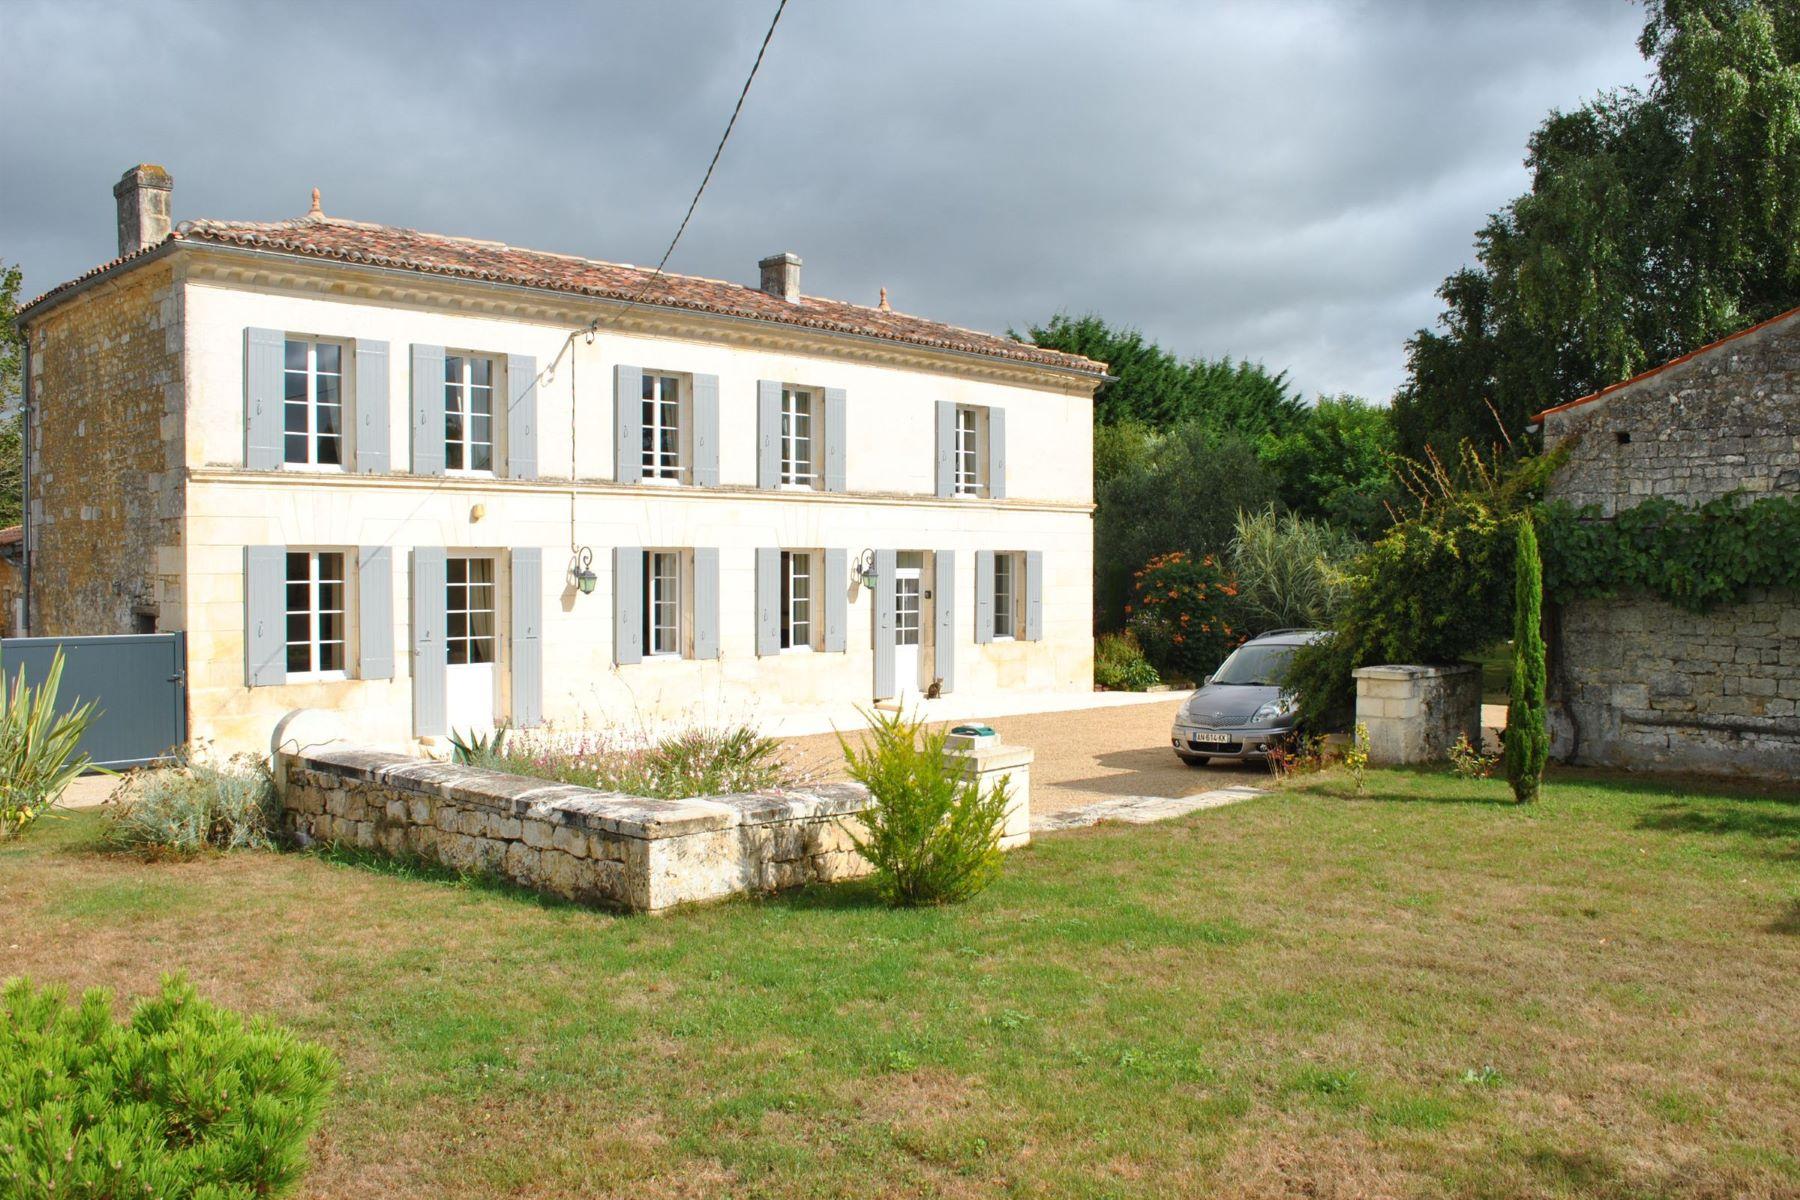 独户住宅 为 销售 在 Charentaise stone house with pool Tesson, 普瓦图夏朗德, 17460 法国